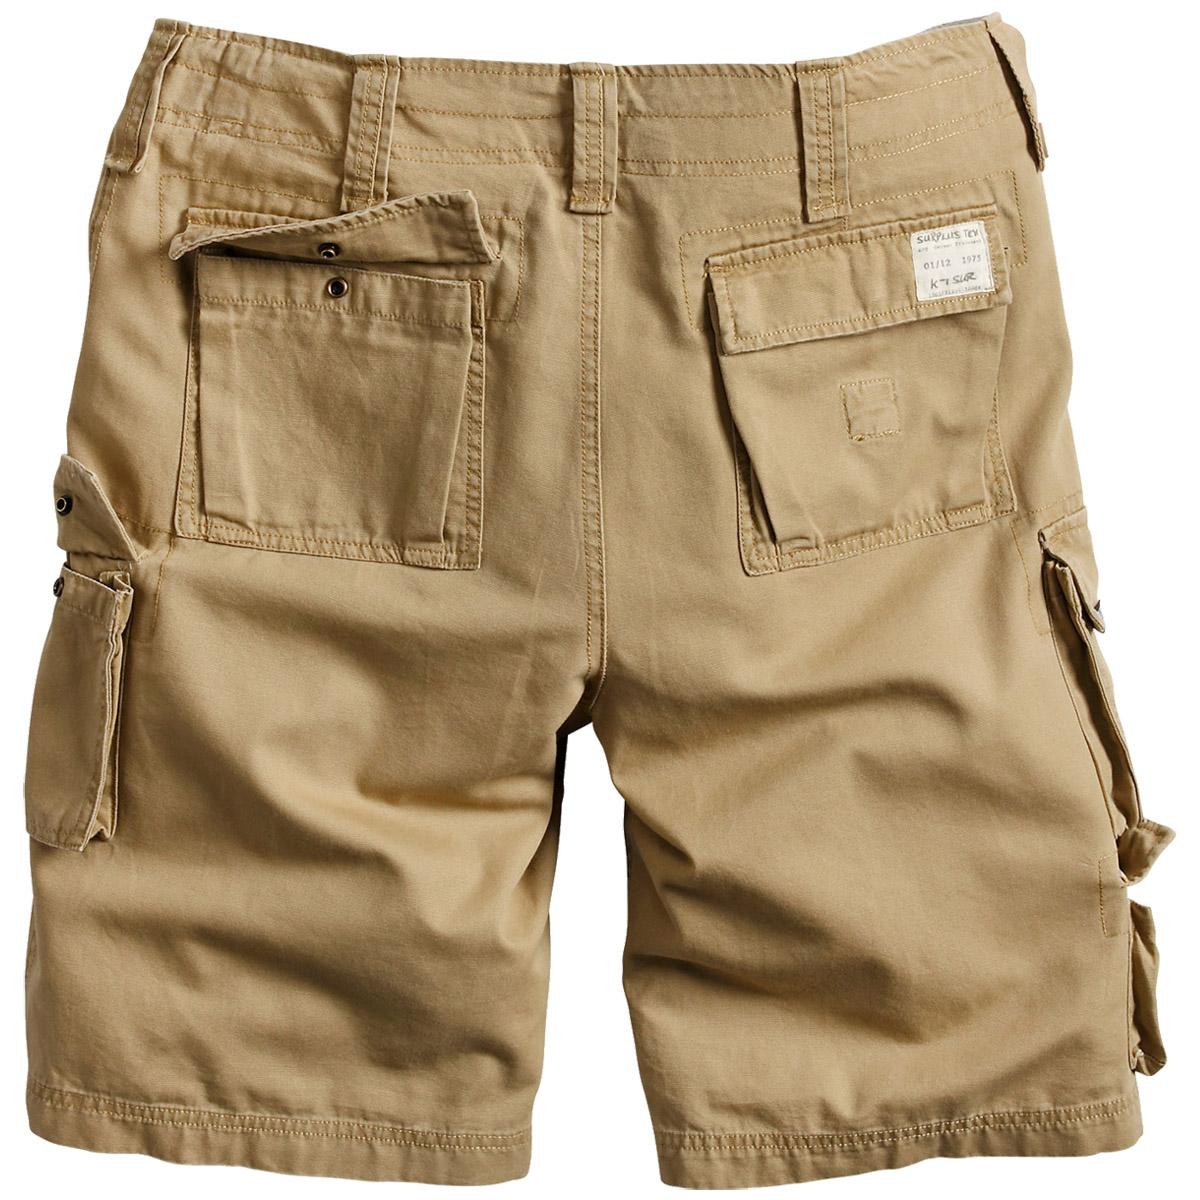 Surplus Trooper Combat Shorts Mens Cargo Bermudas Cotton Summer Olive Washed